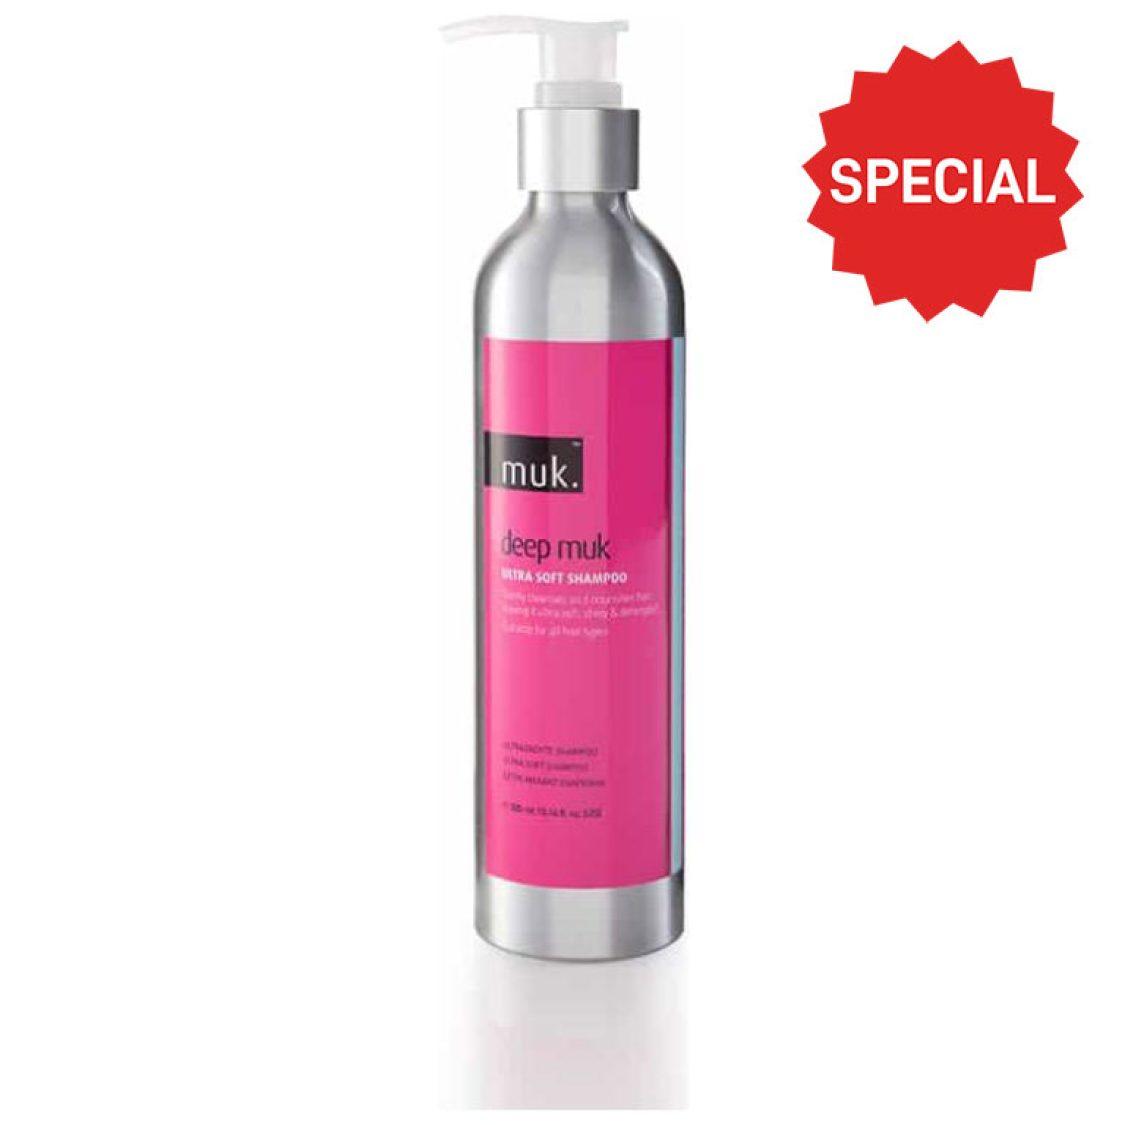 Muk - Haircare - Deep muk Ultra Soft Shampoo 300ml